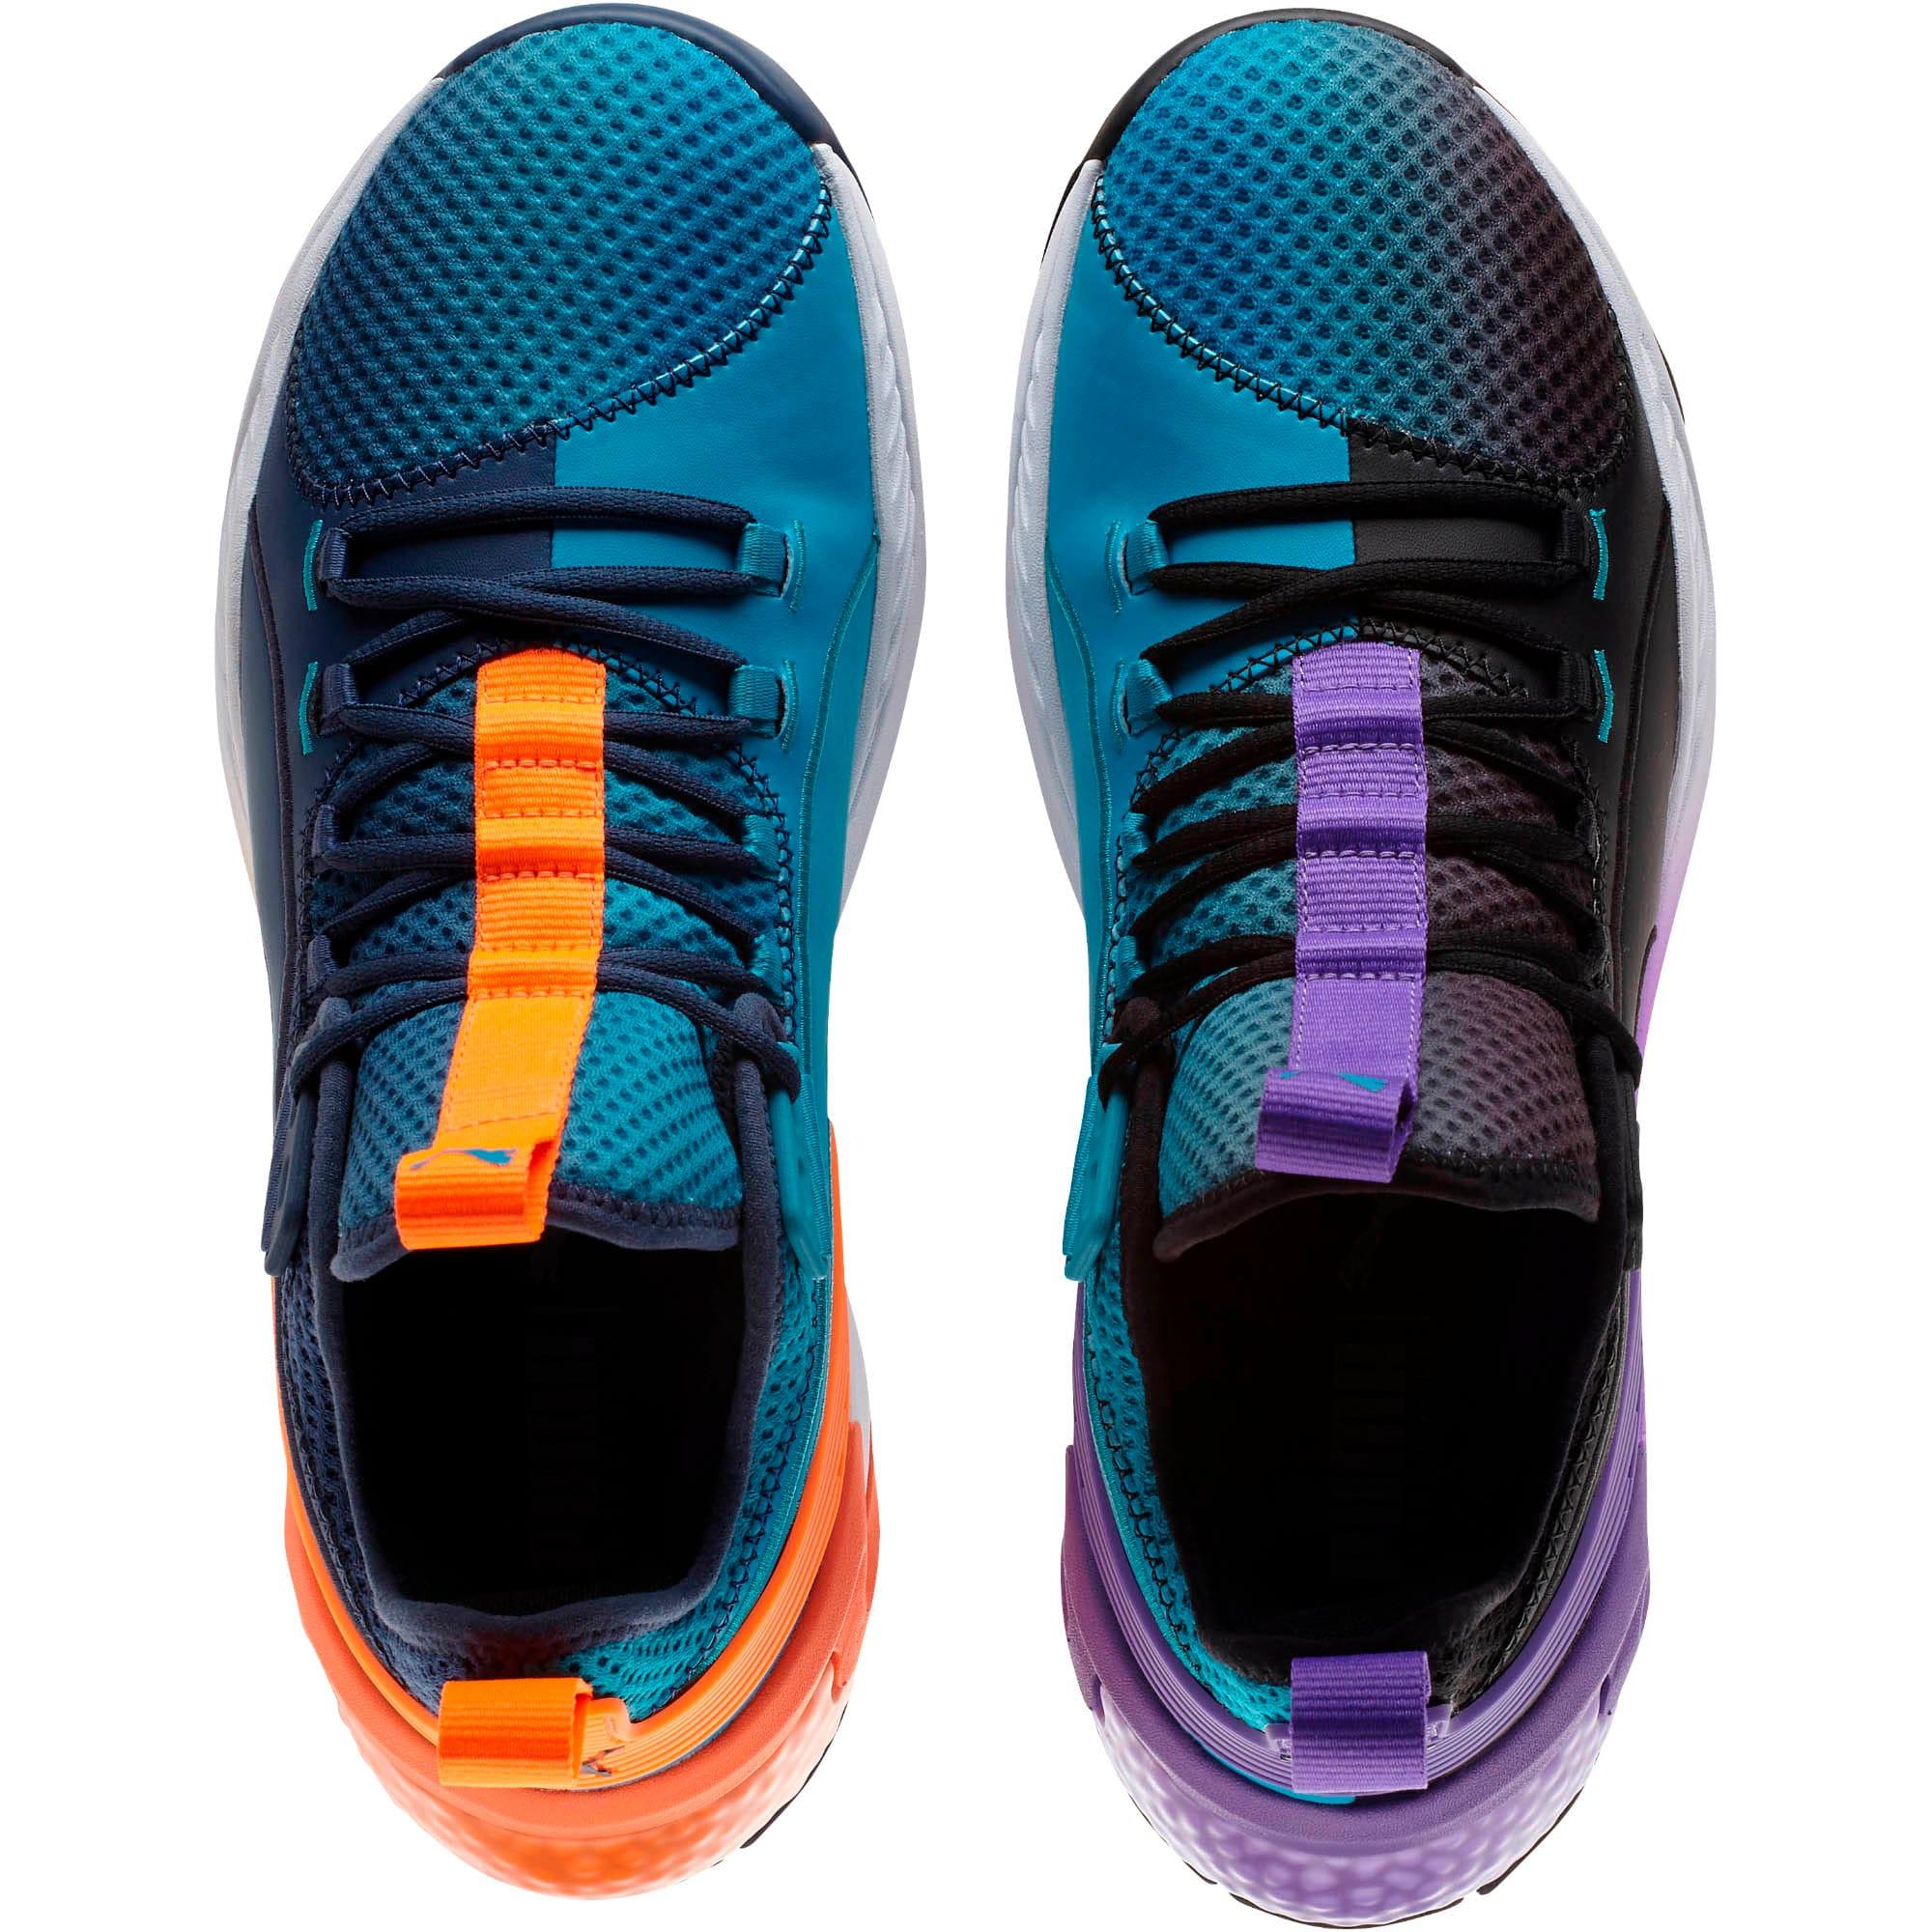 Uproar Charlotte ASG Fade Basketball Shoes